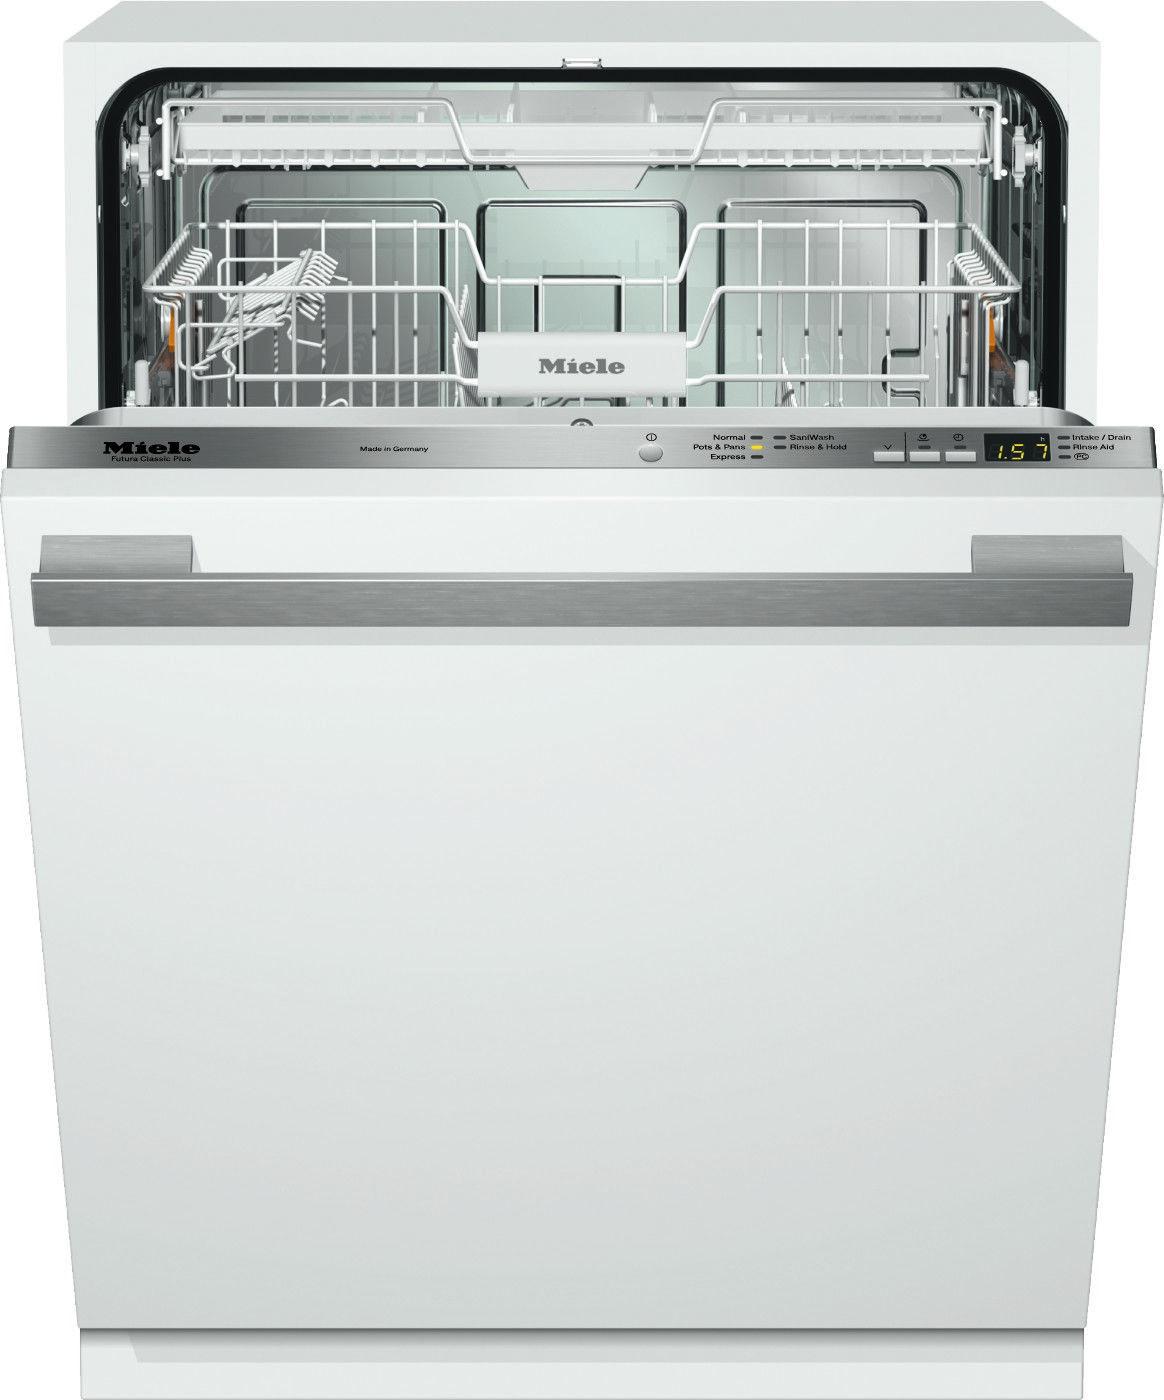 Pin By Becky Zea On Morton Shapiro Kitchen Integrated Dishwasher Fully Integrated Dishwasher Miele Dishwasher